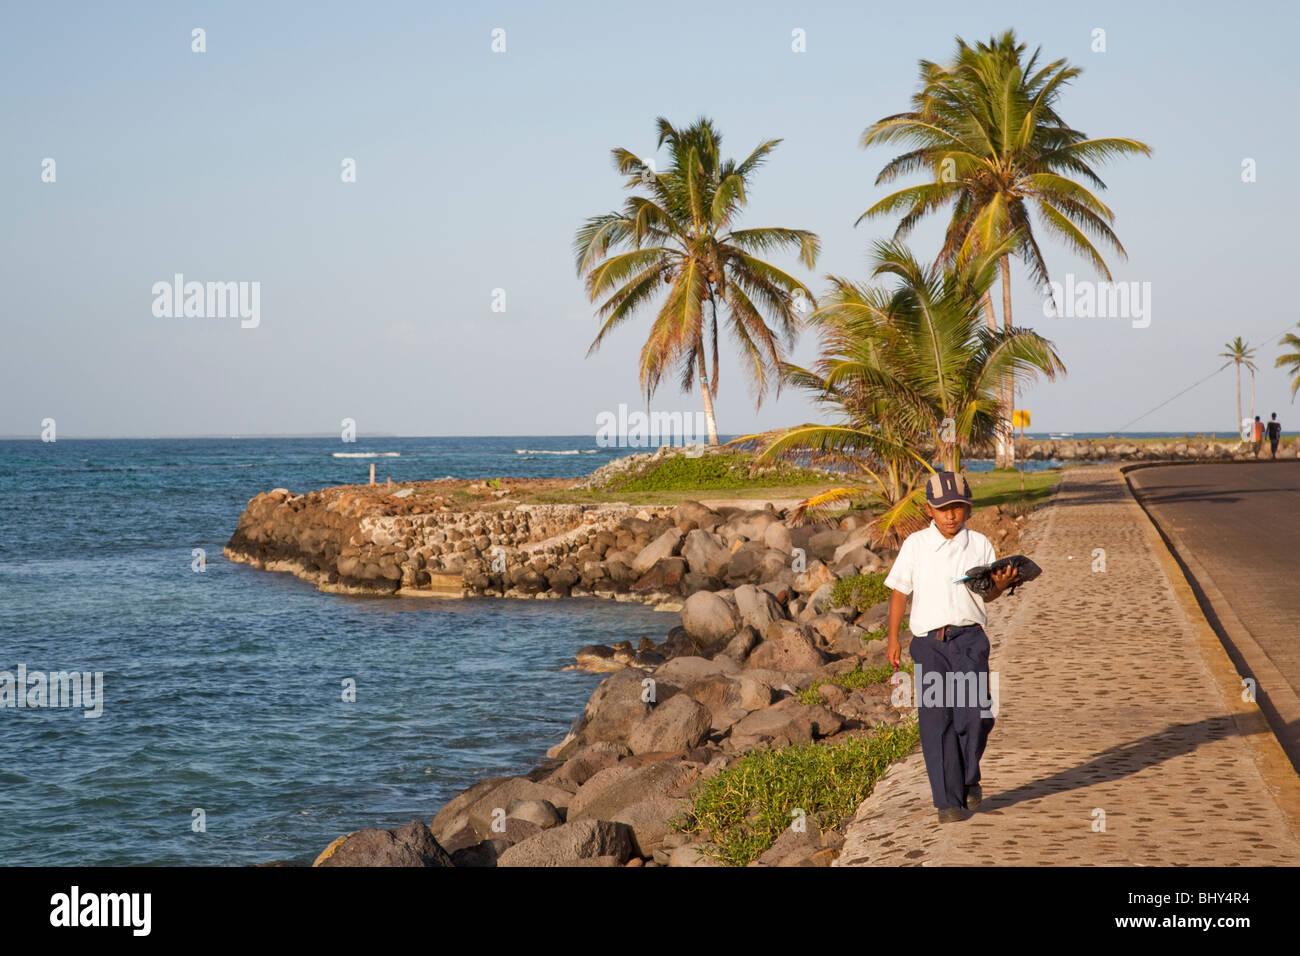 North End, Big Corn Island, Nicaragua Stock Photo